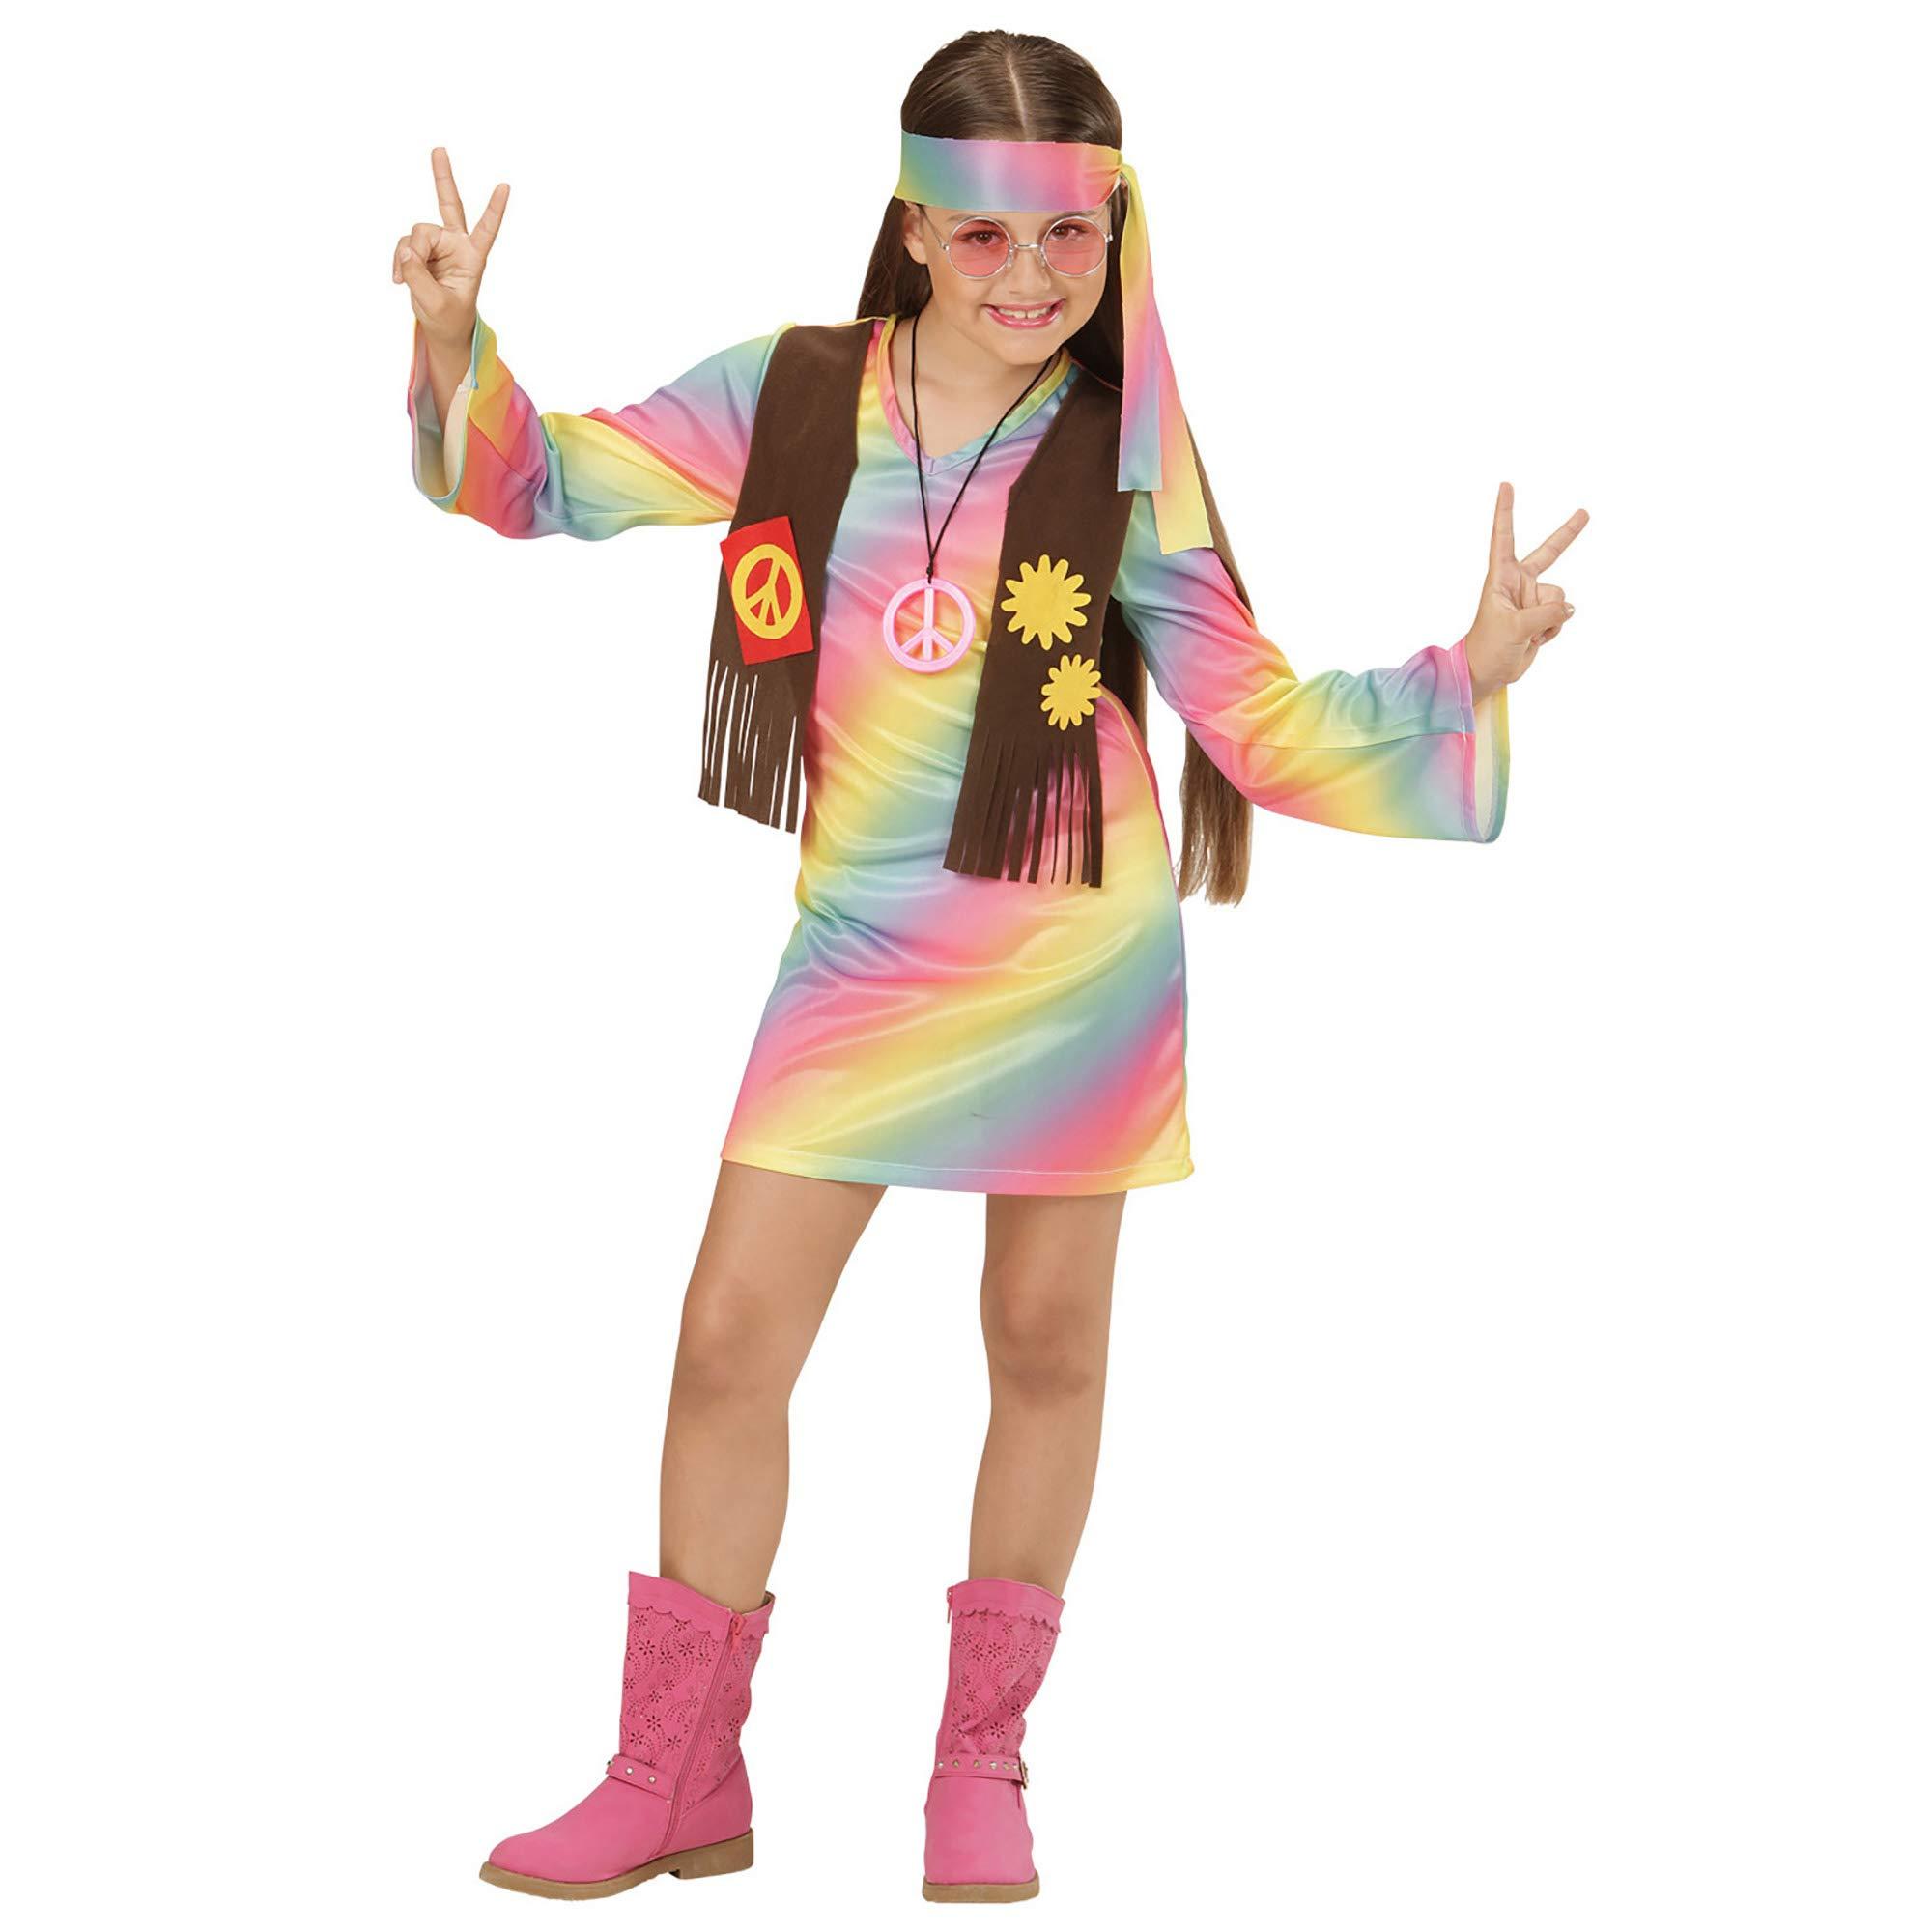 WIDMANN 73358 ? Disfraz de hippie Chica vestido angenähte Chaleco ...